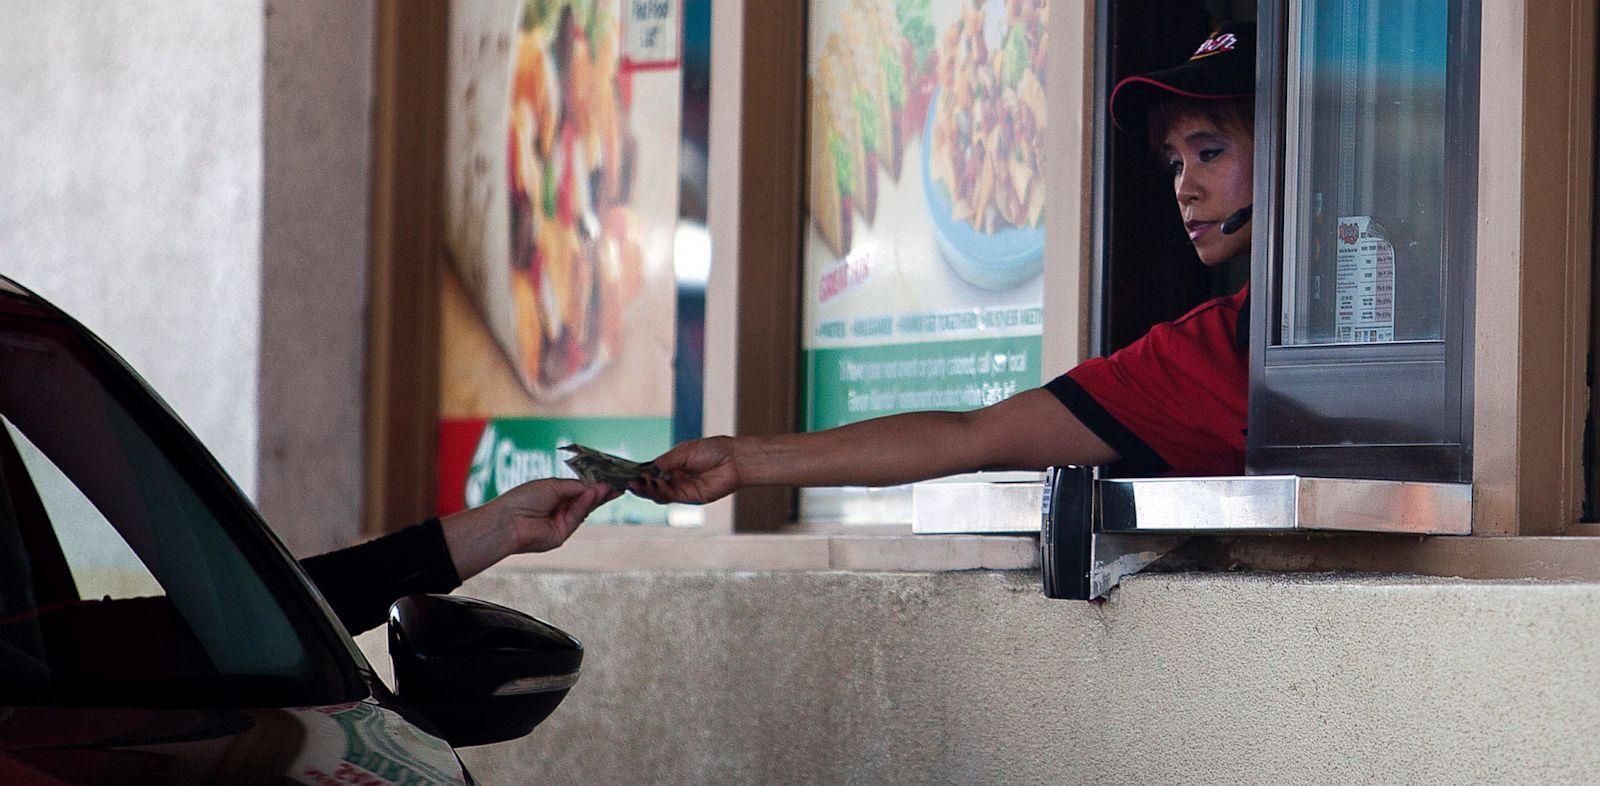 PHOTO: A Carls Jr. employee gives a customer change through a drive-thru window in San Francisco